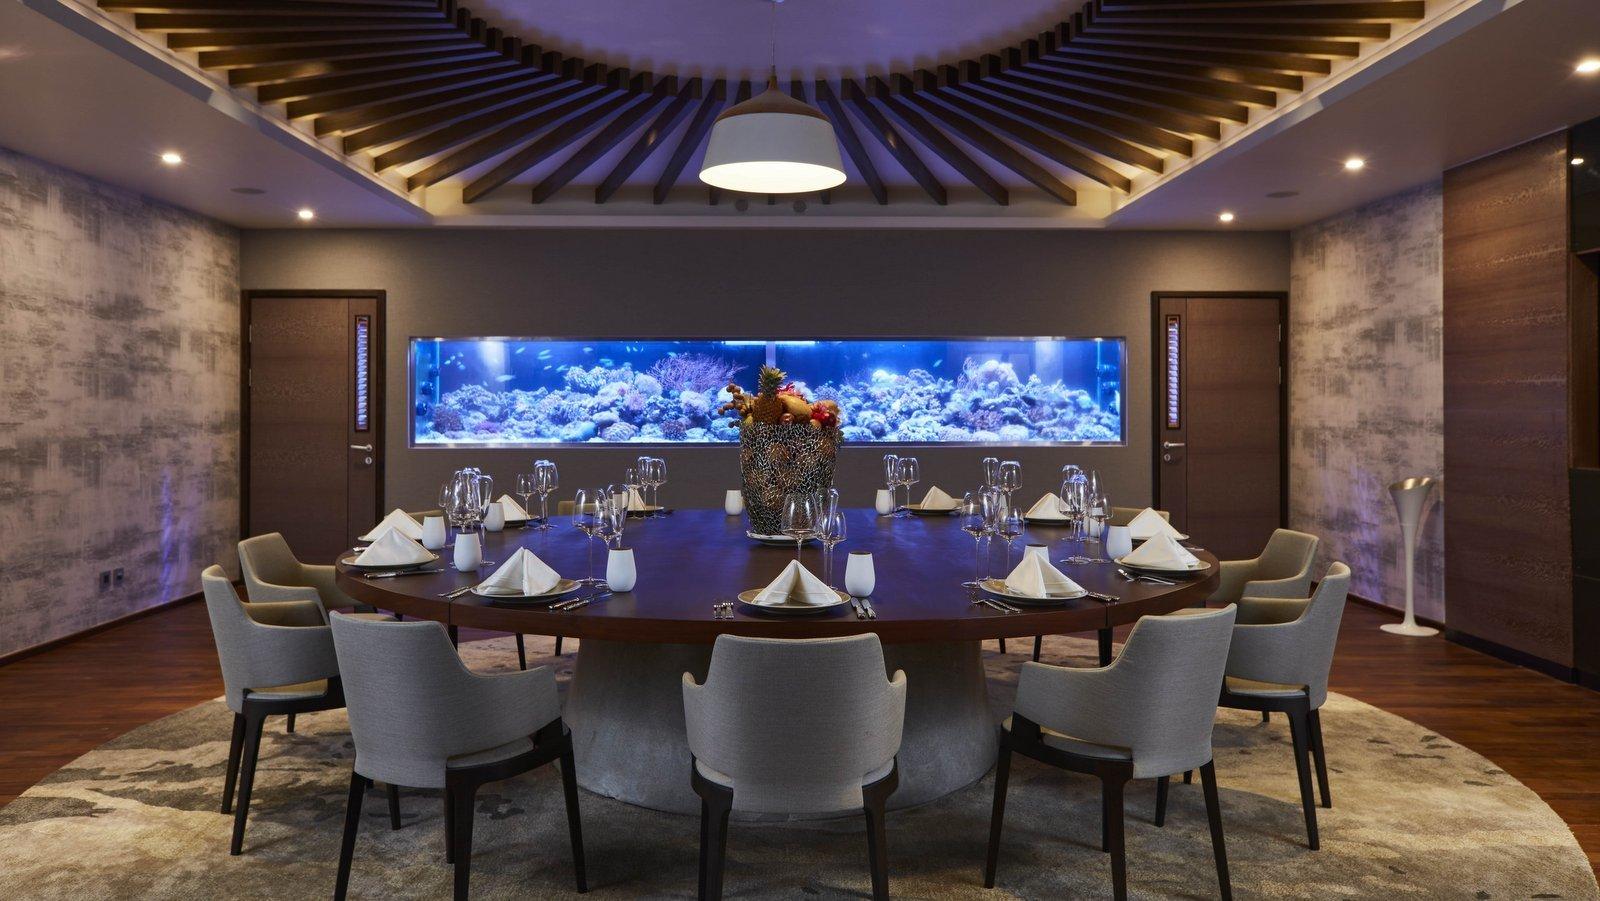 Мальдивы, отель LUX North Male Atoll, ресторан Barium